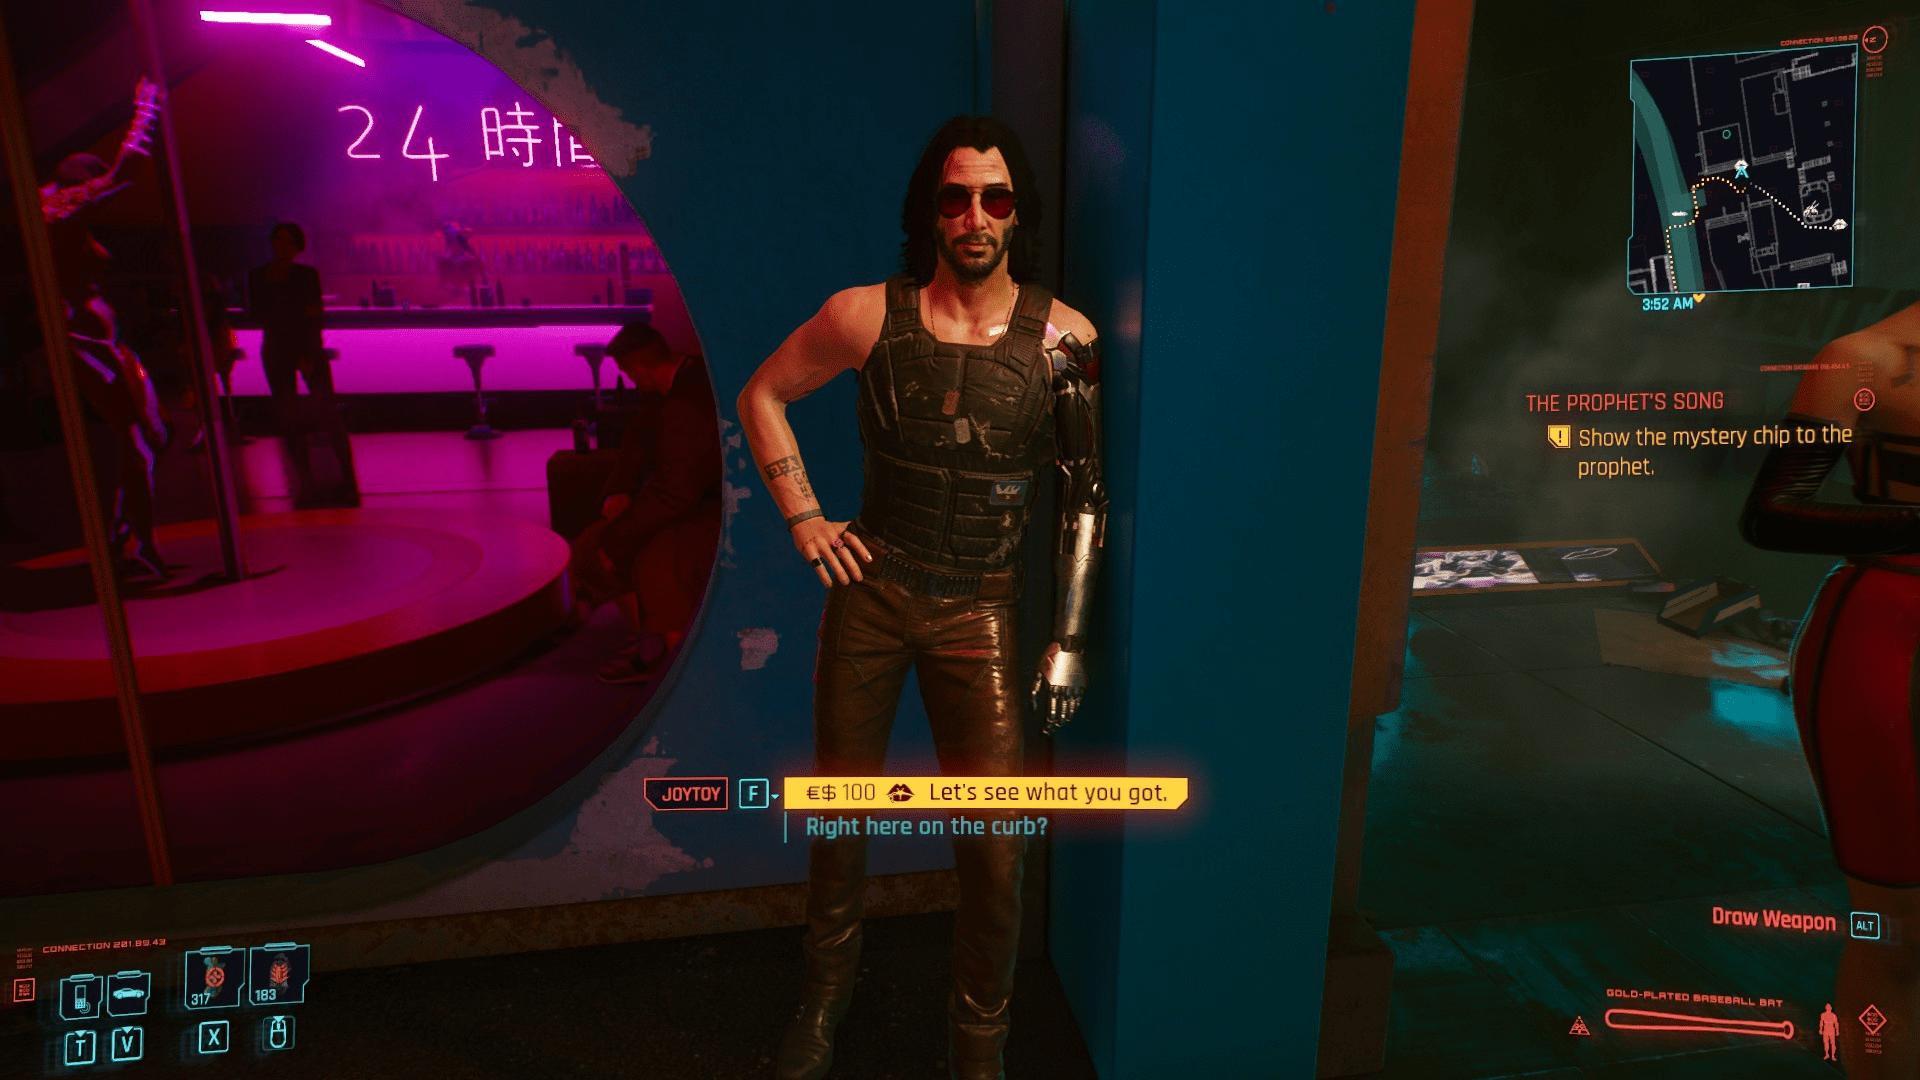 CDPR отправляют комьюнити в horny jail за мод секса с Киану Ривзом в Cyberpunk 2077